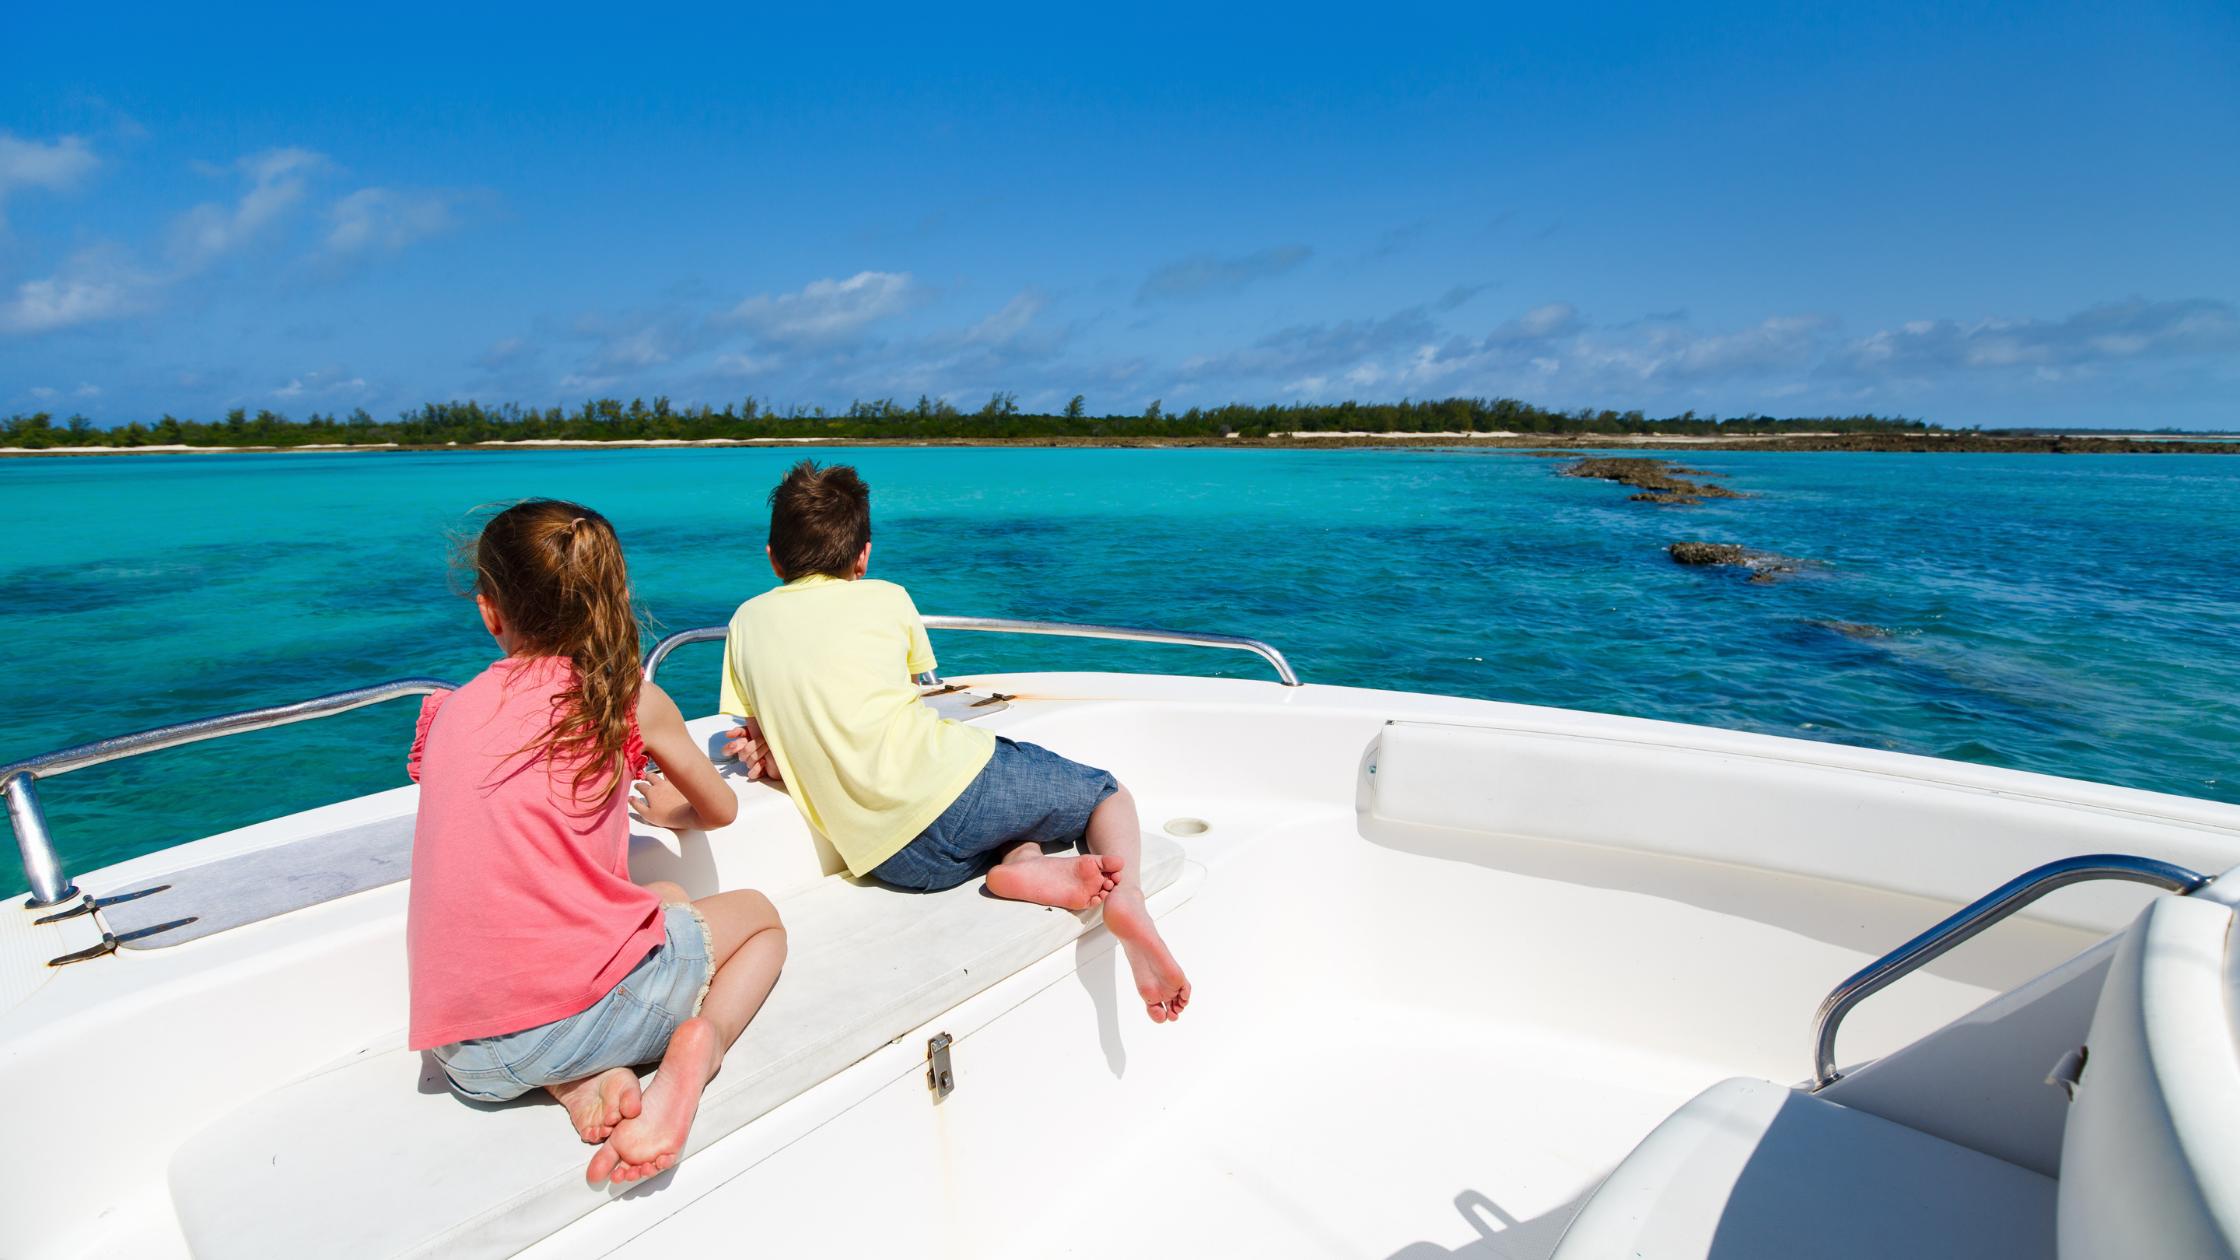 Snag-A-Slip blog - Kids Boating Accessories